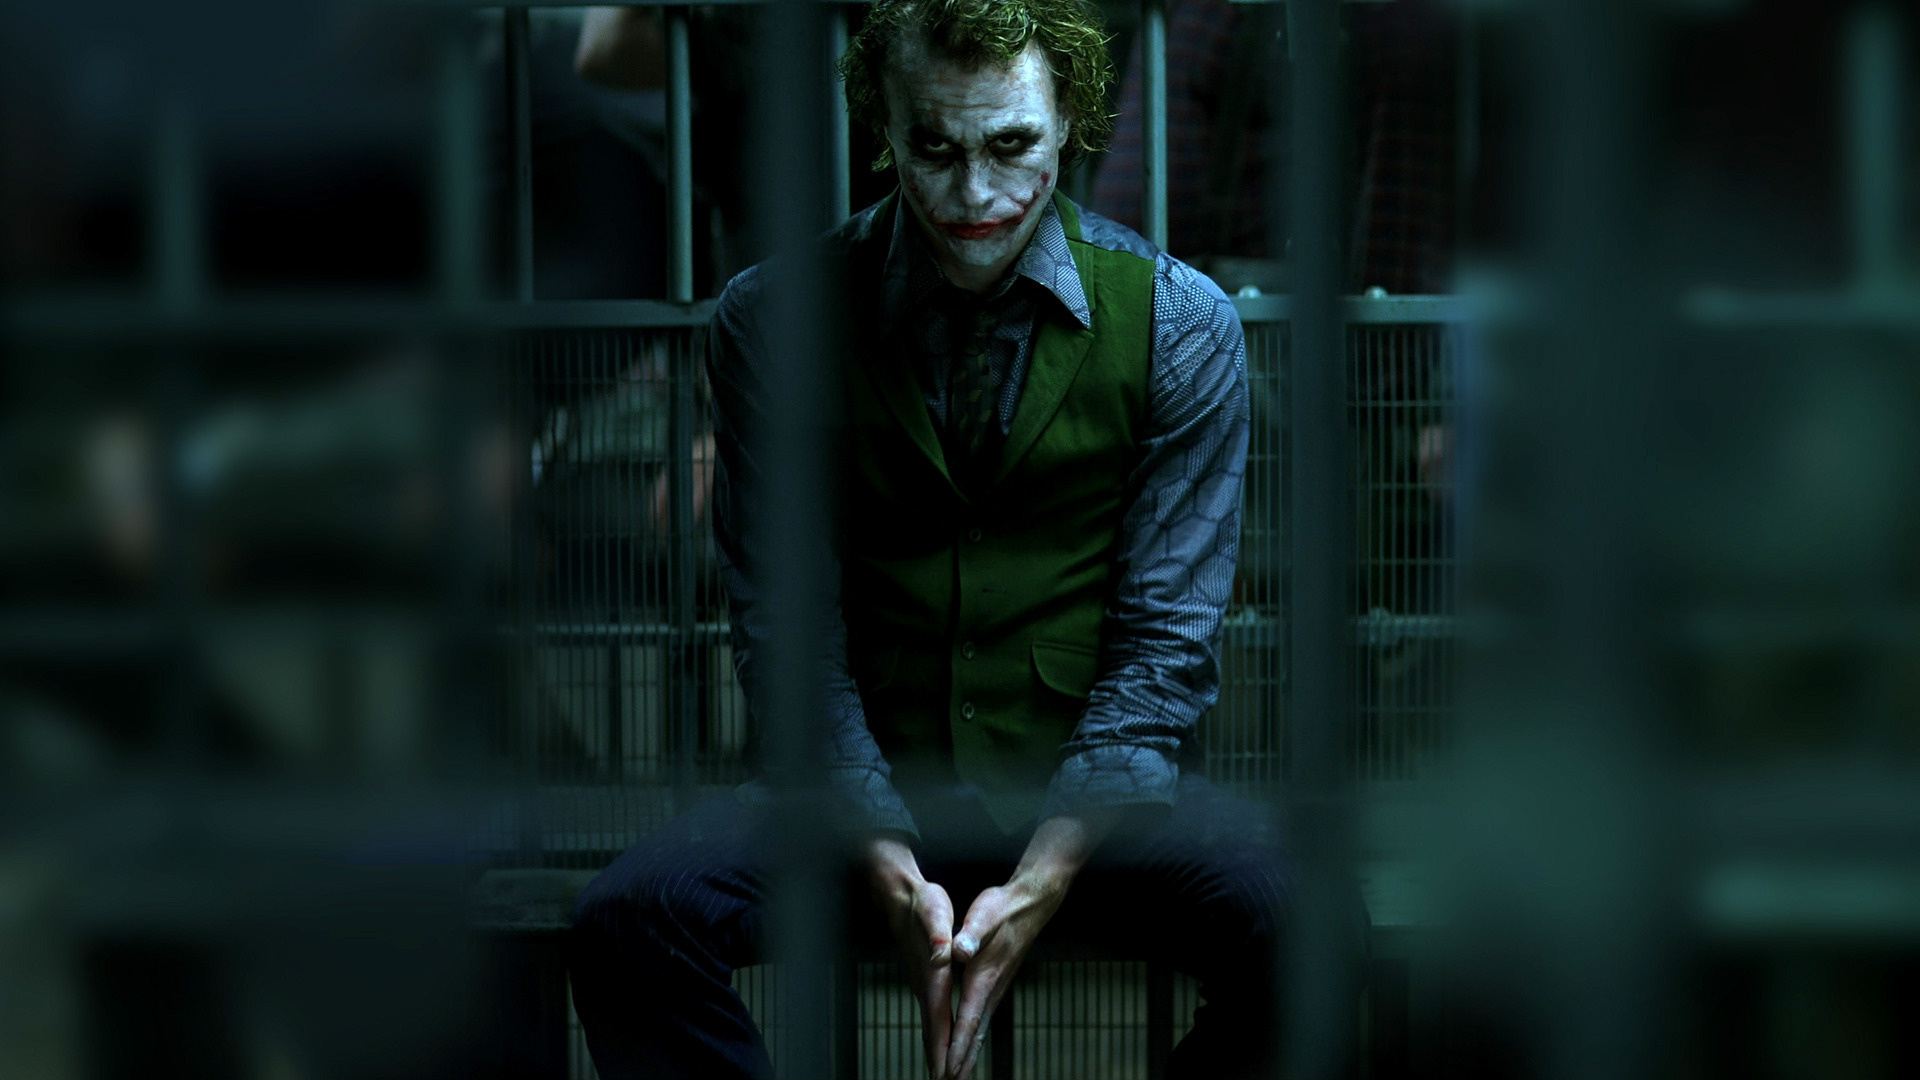 The Ultimate Joker Wallpaper 1920x1080